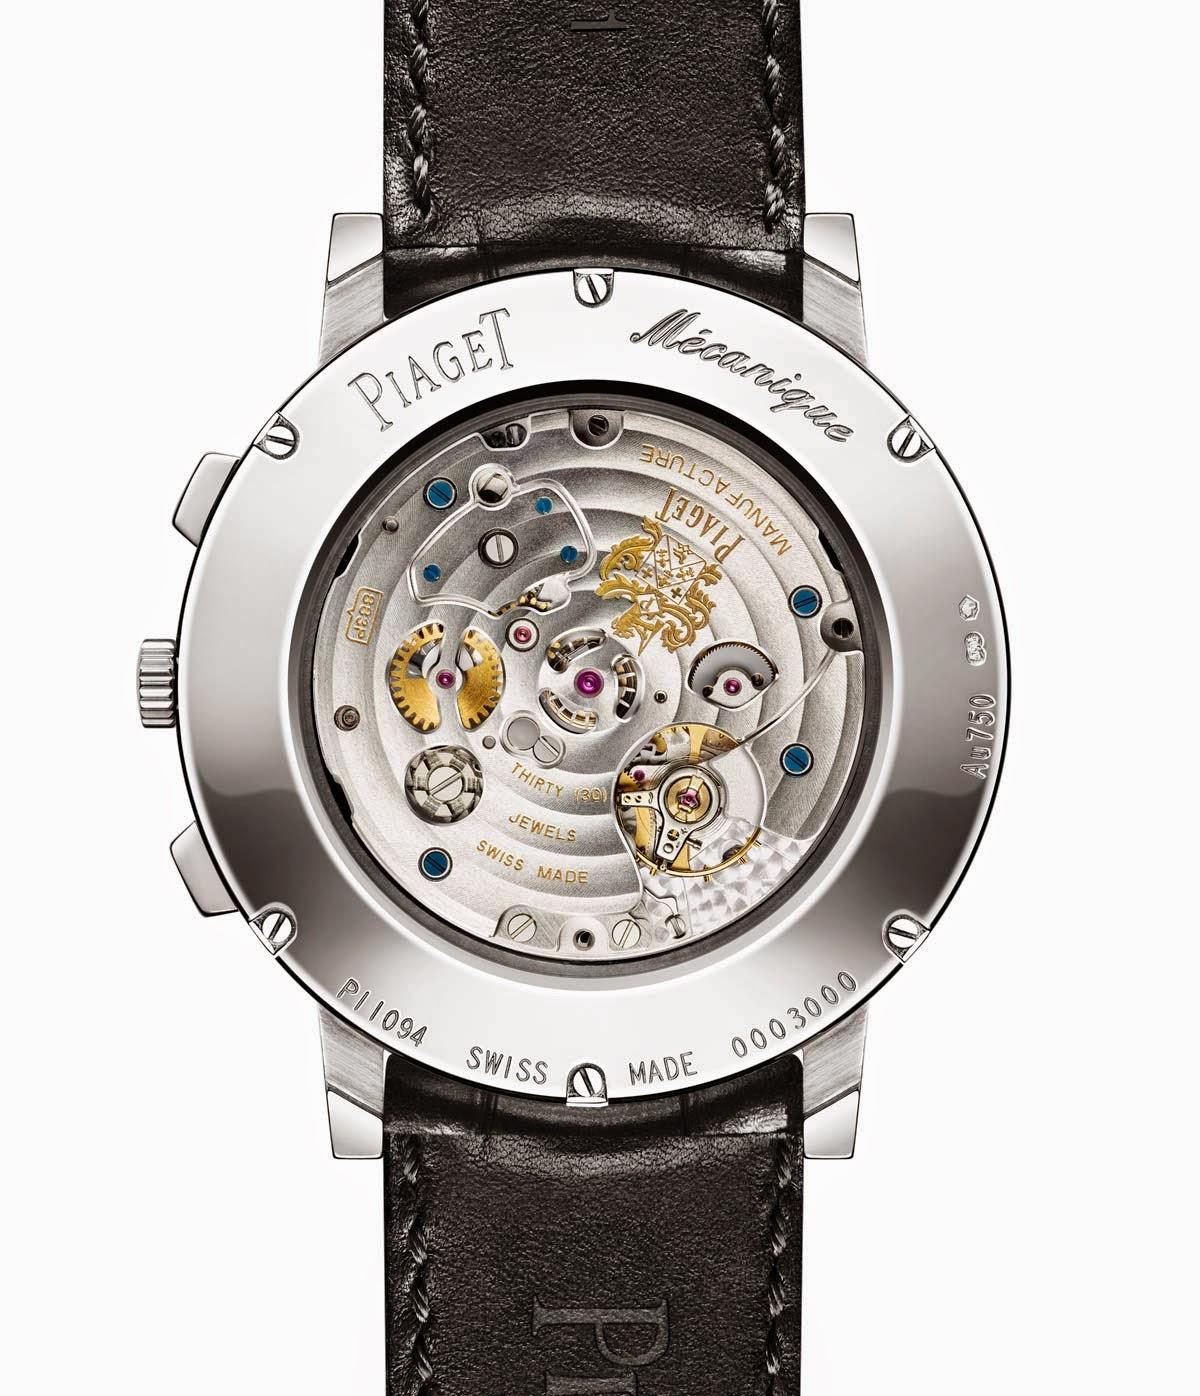 Piaget-Altiplano-Chronograph-back